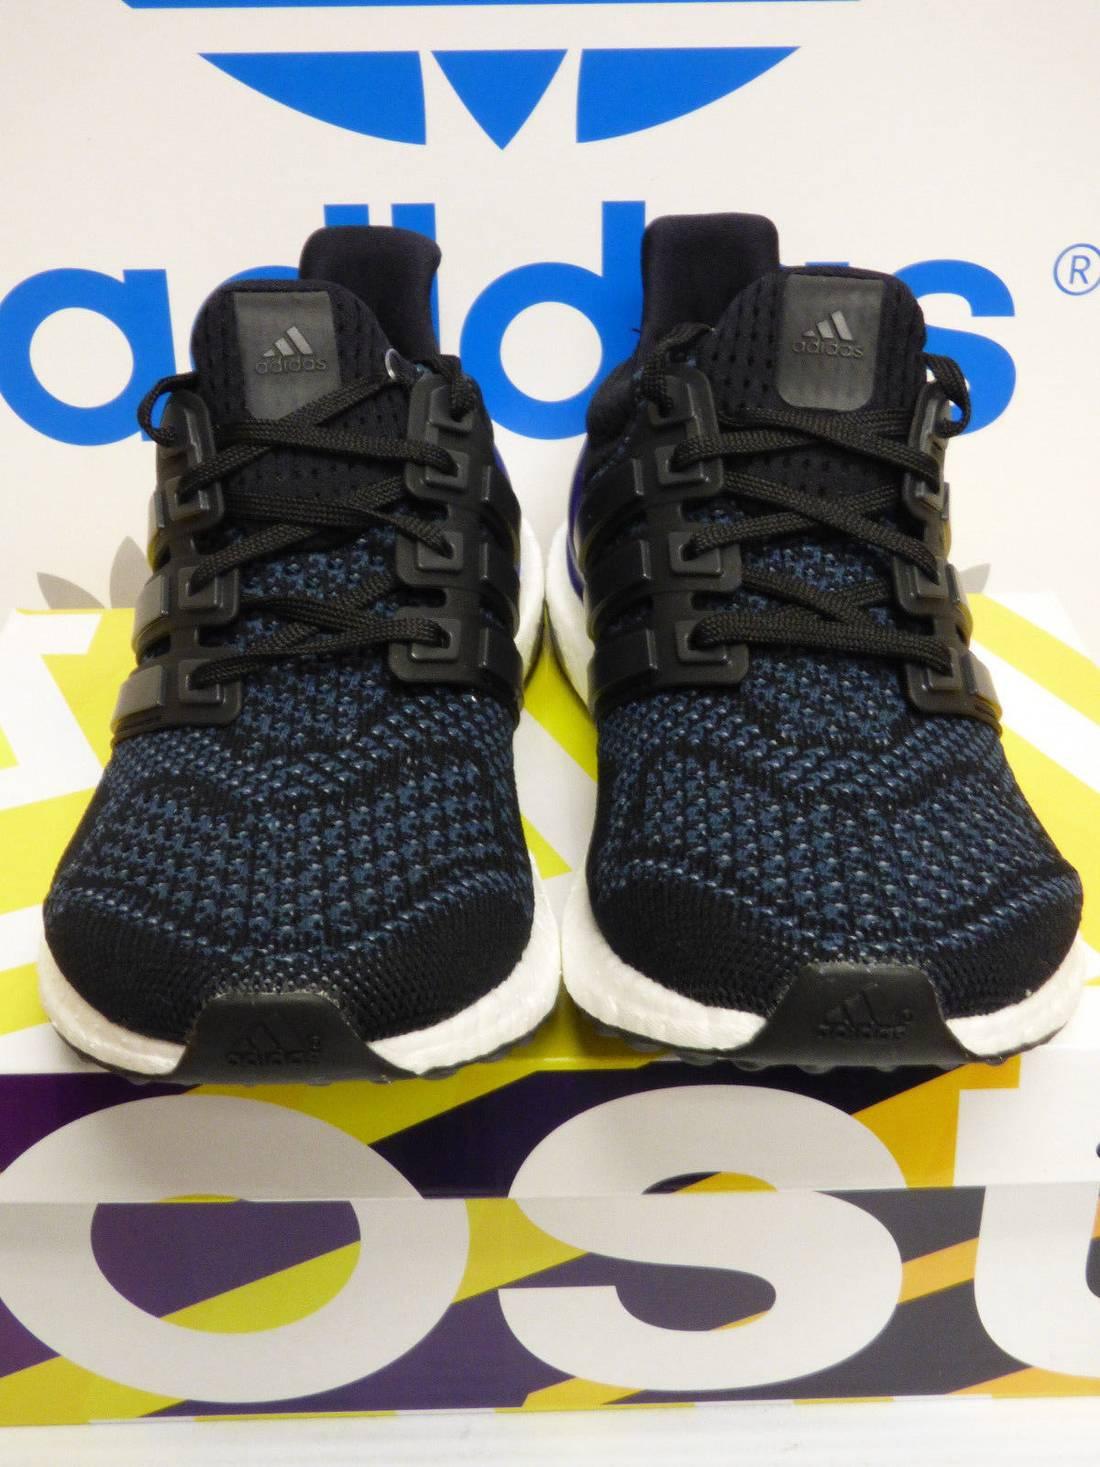 405efc23b6dca ... real adidas ultra boost 1.0 og core black purple b27171 size us 8.5 eu  19ca3 bdc88